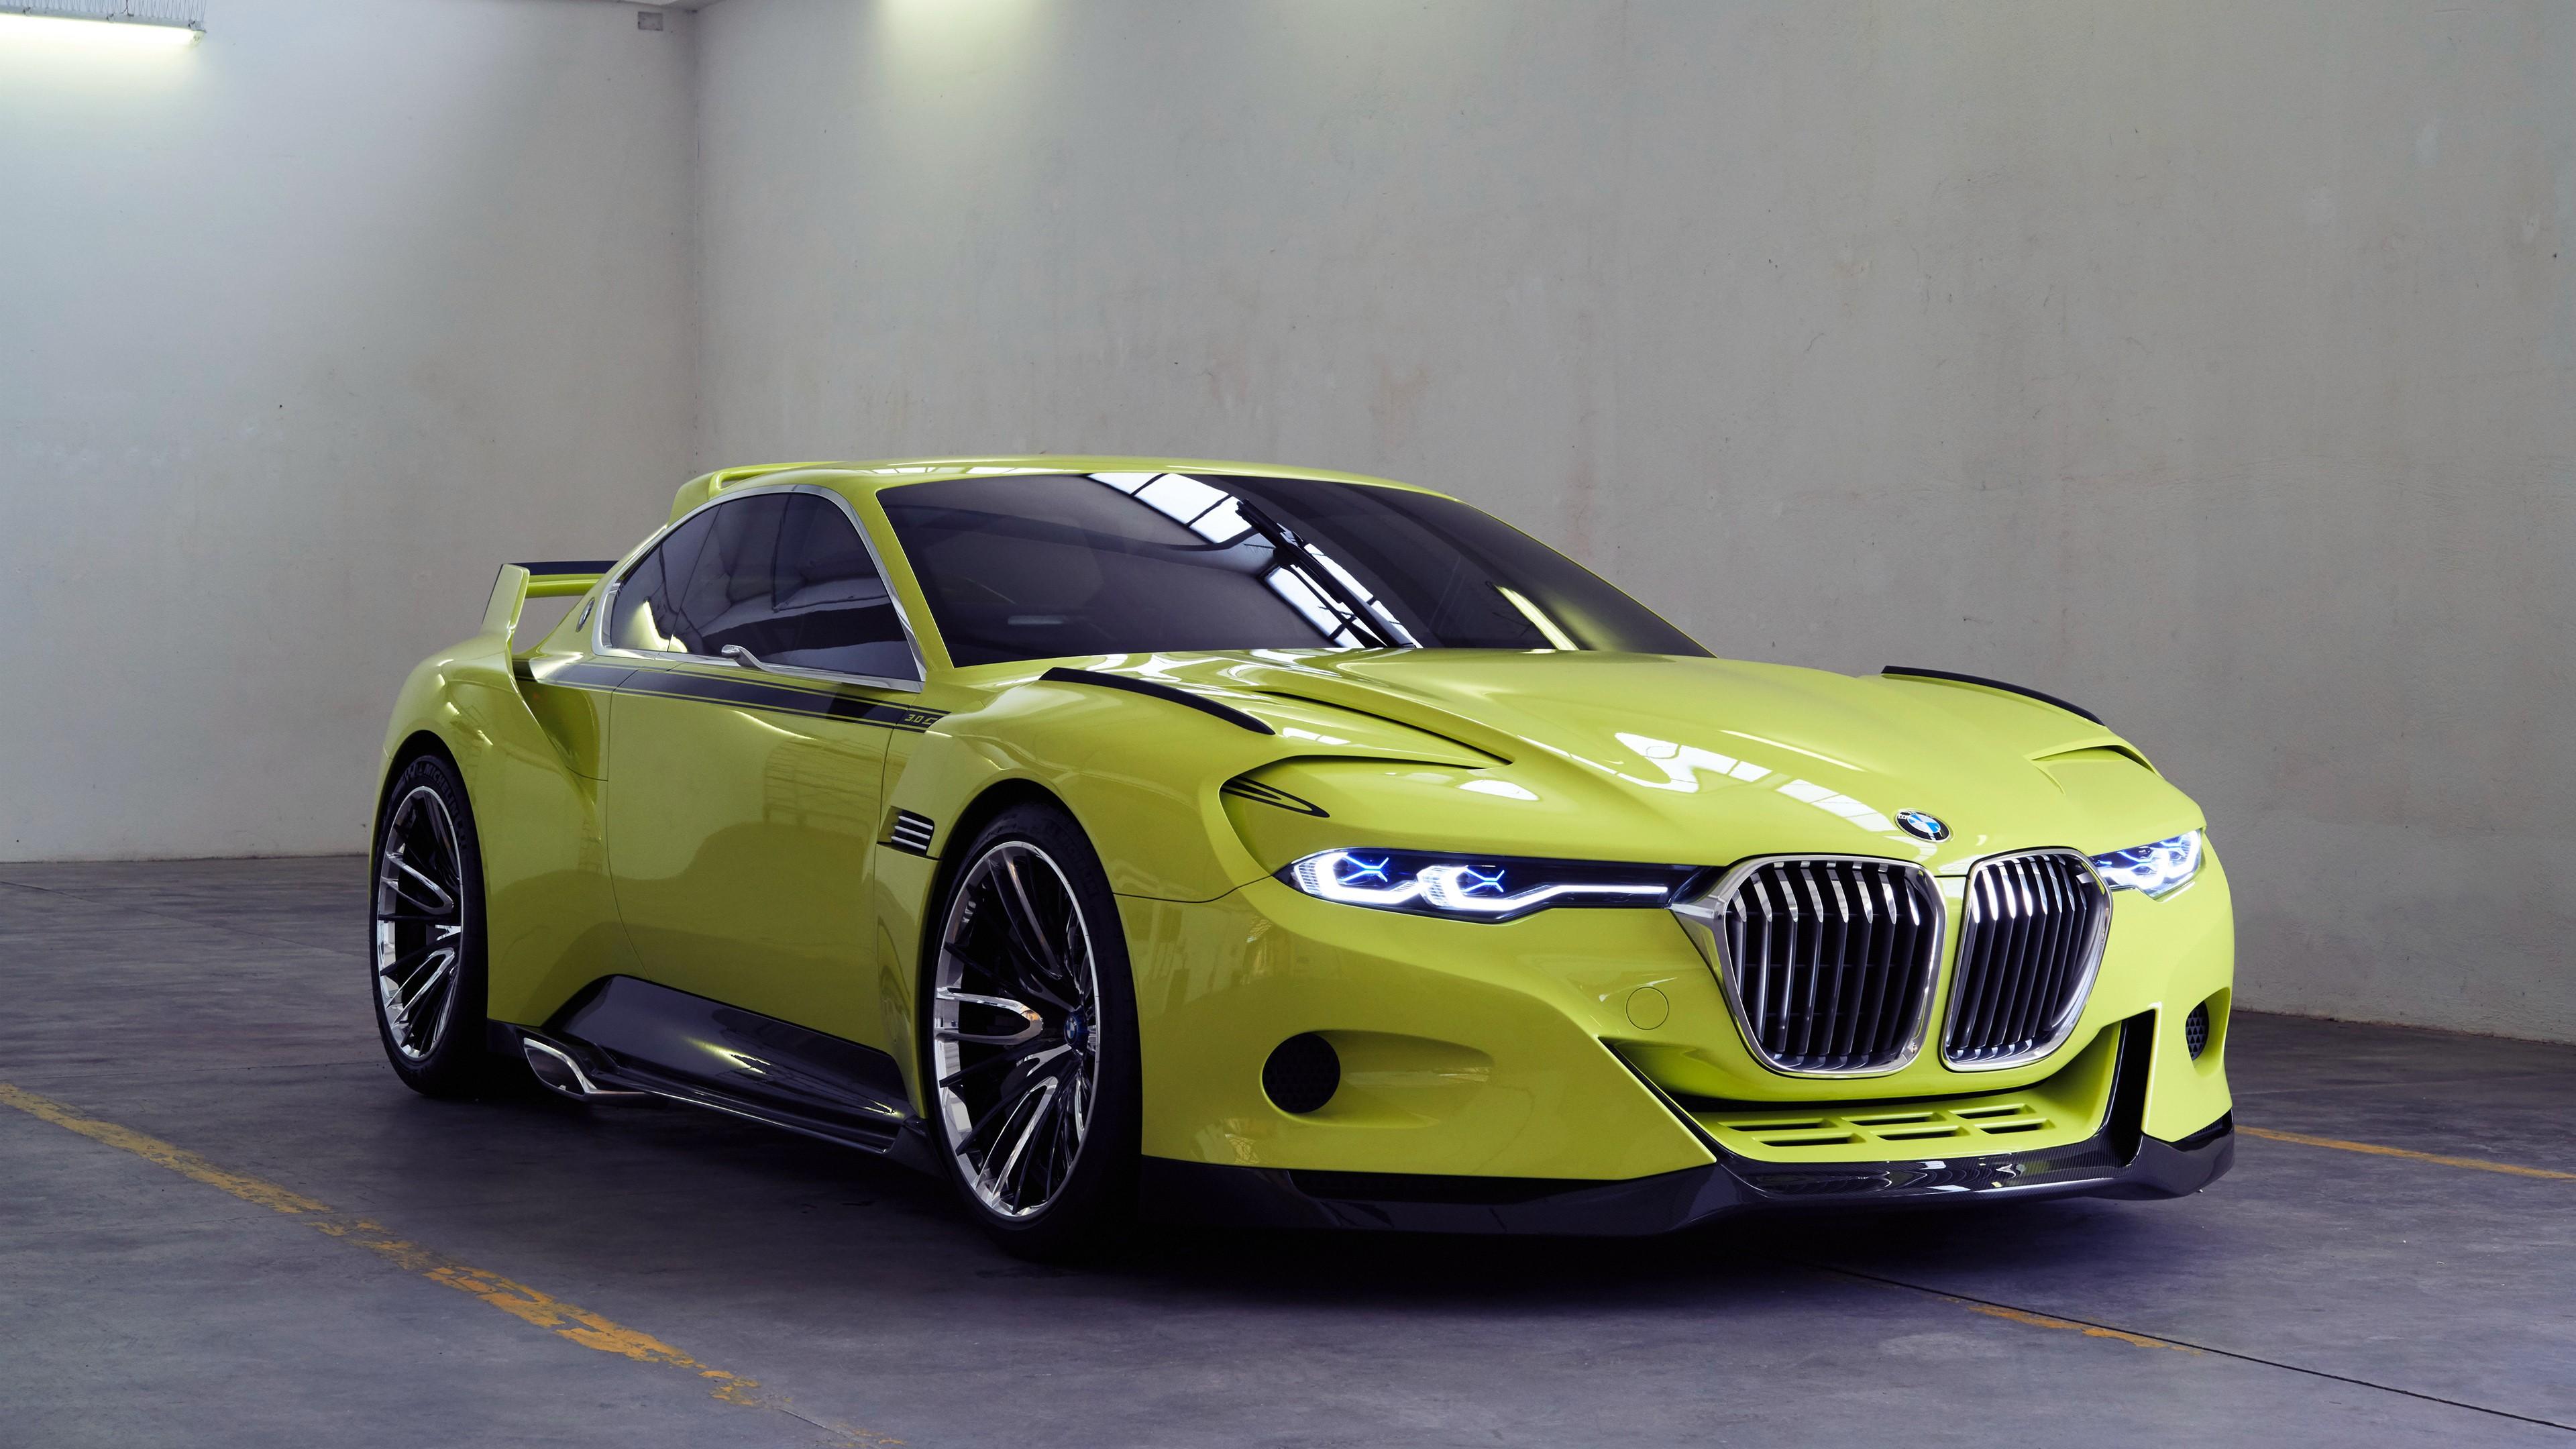 ultra hd wallpapers 8k cars,land vehicle,vehicle,car,performance car,automotive design